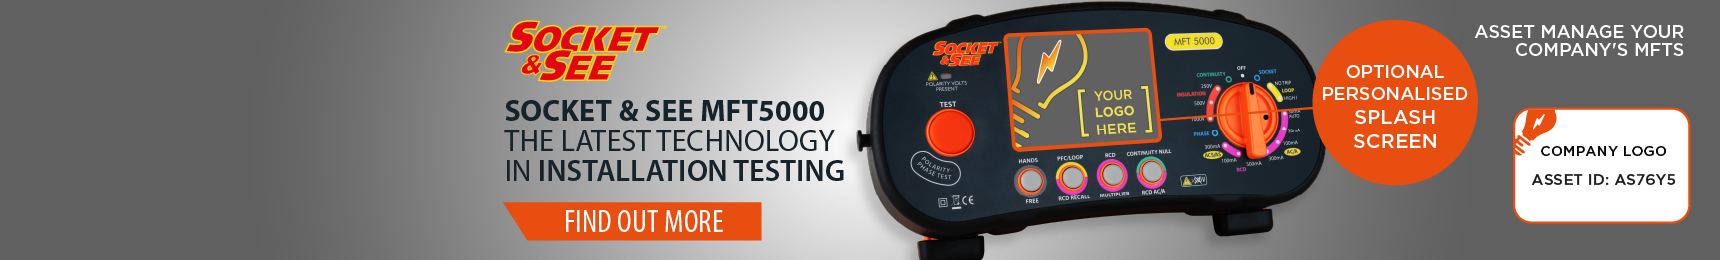 Socket and See MFT5000 Multifunction Tester